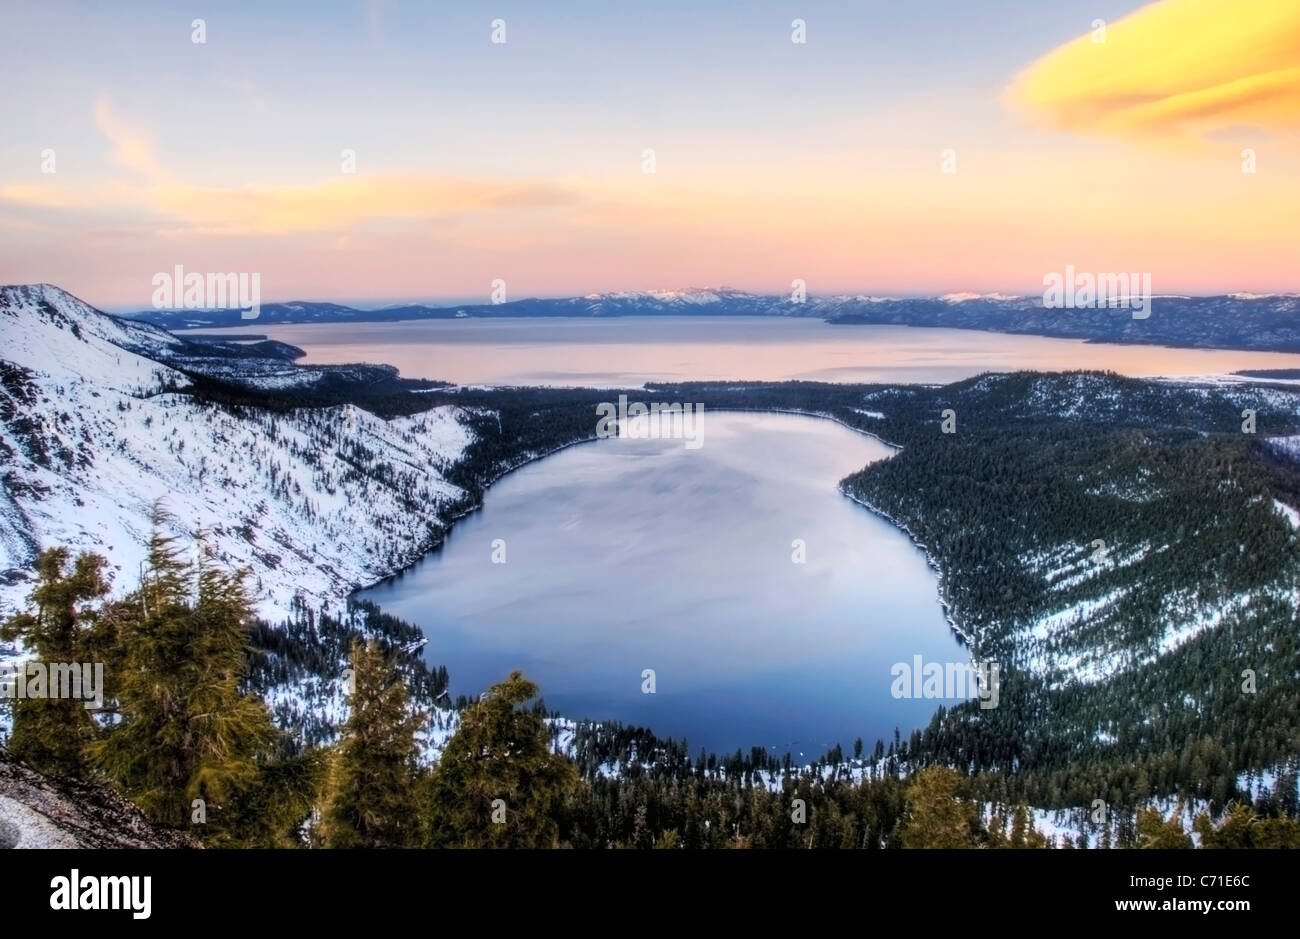 Gefallene Blatt Lake und Lake Tahoe bei Sonnenuntergang im Winter, California. Stockbild